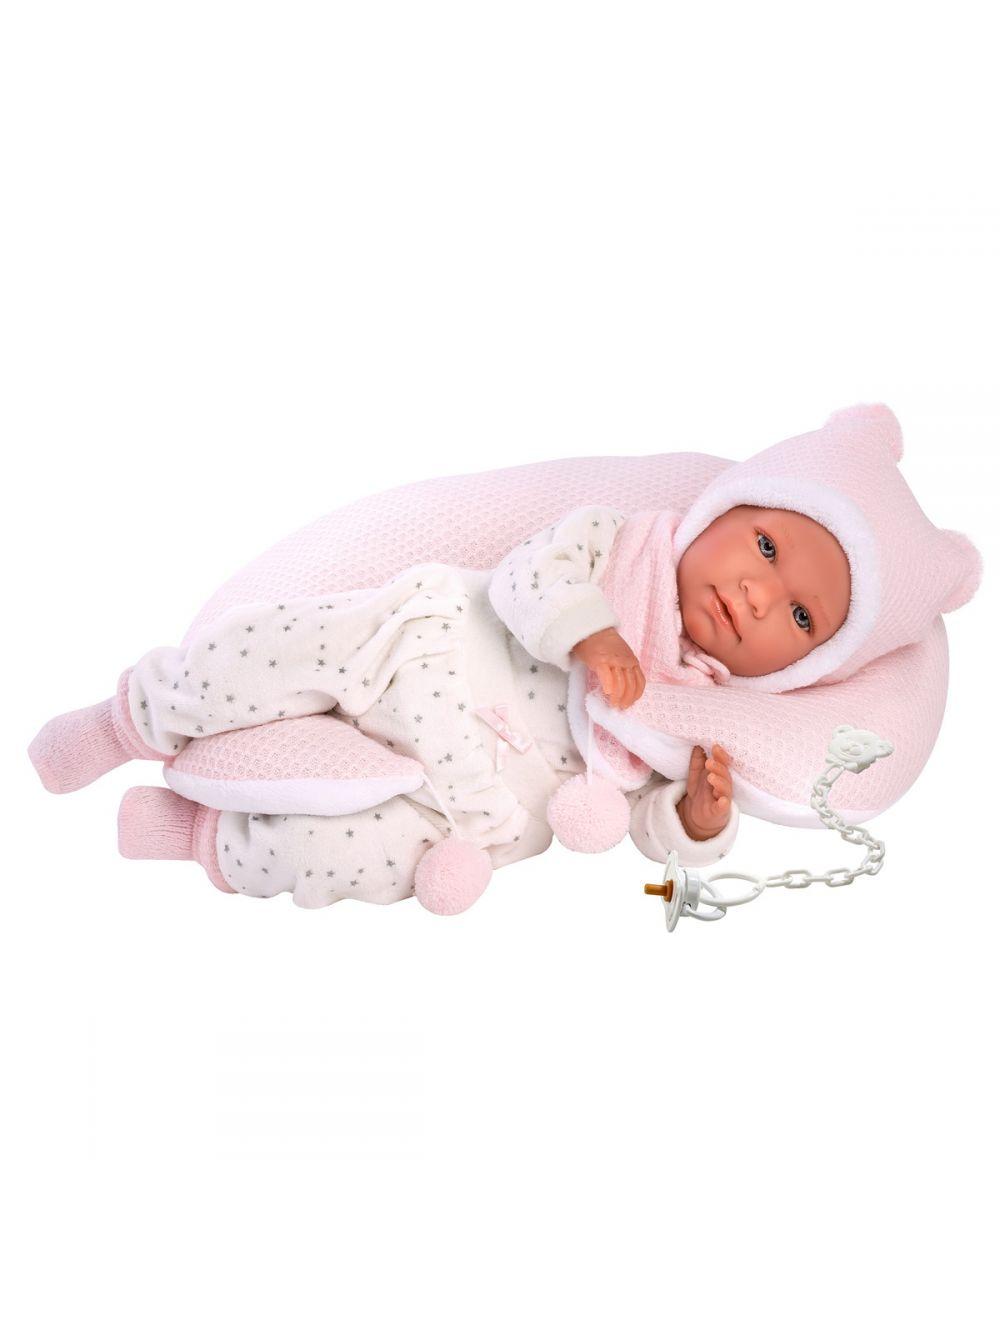 Llorens 74052 Lalka bobas Mimi płacząca 42 cm różowa poduszka